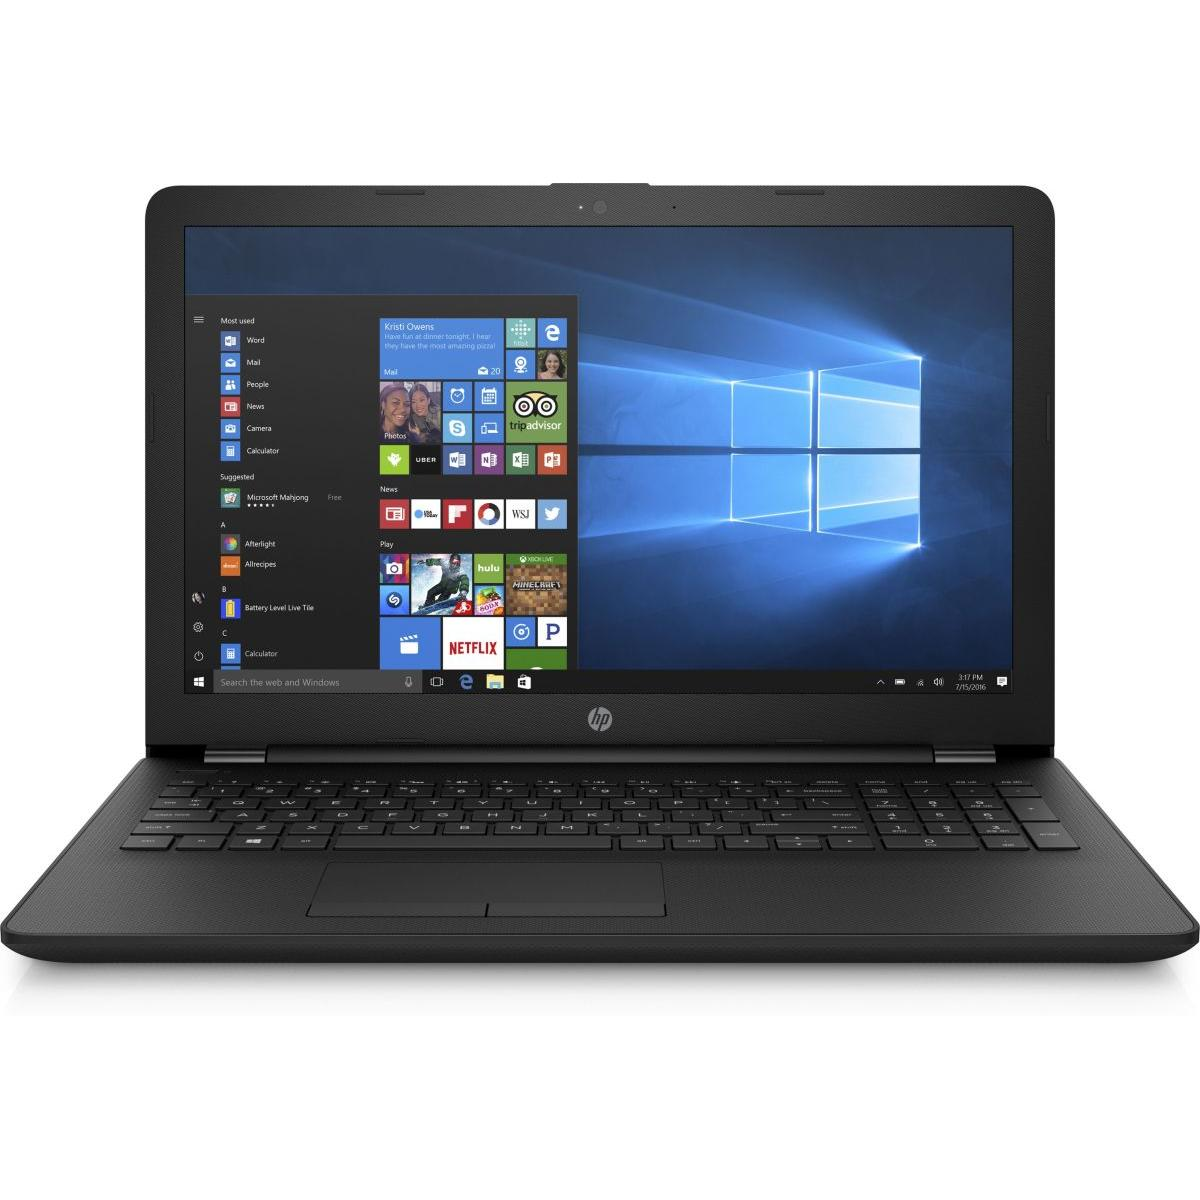 "HP 15-bw000nf 15"" E2-Series 1,5 GHz - HDD 500 GB - 4GB AZERTY - Französisch"